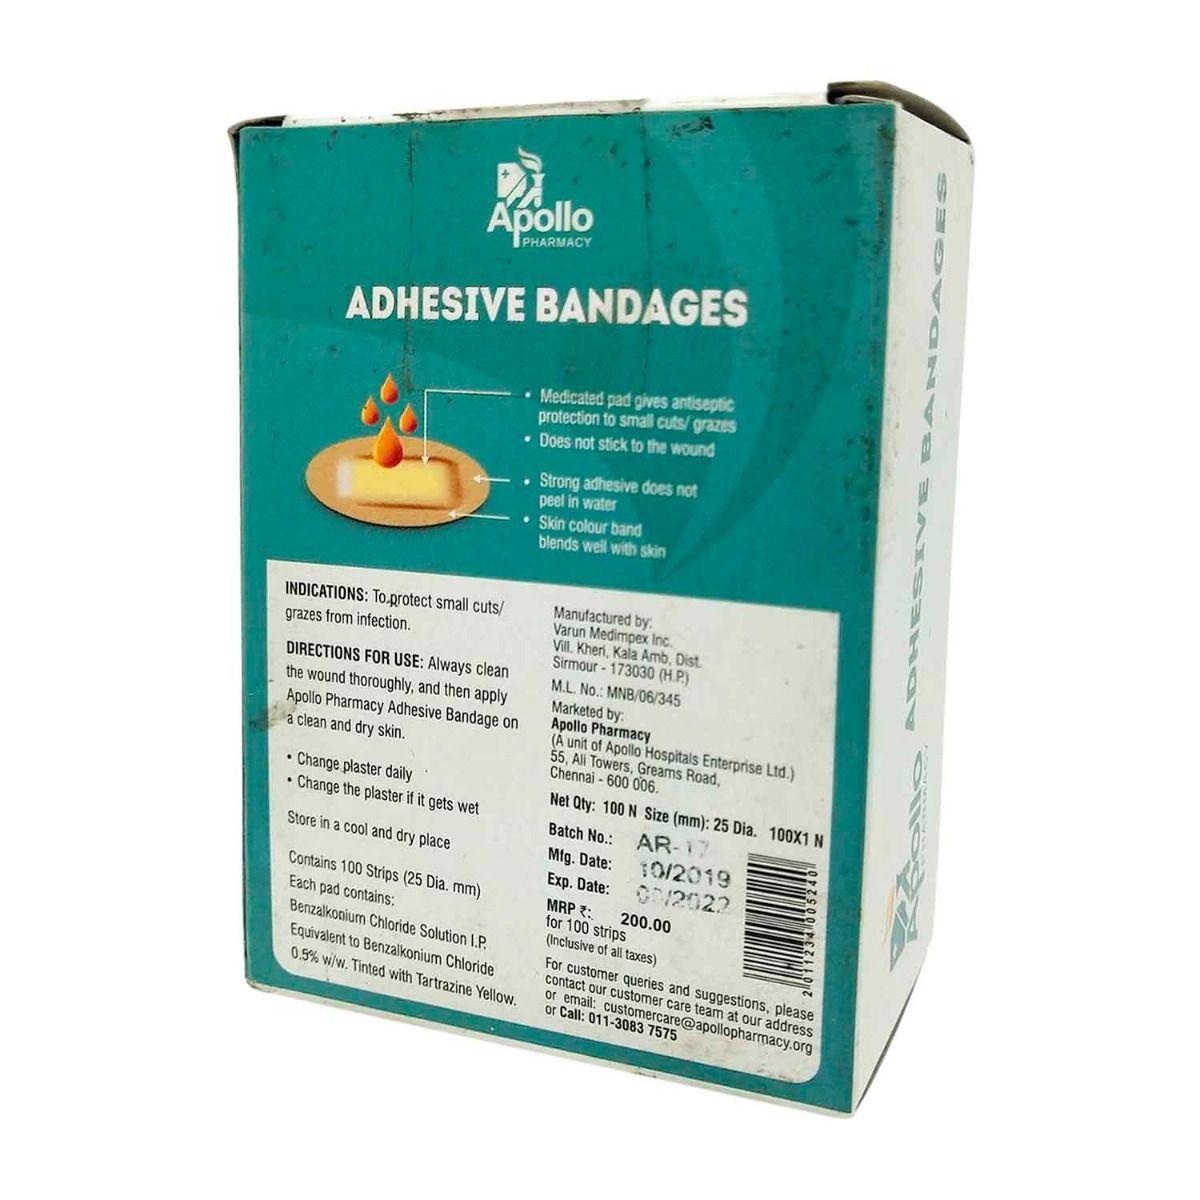 Apollo Pharmacy Adhesive Round Bandage Wash Proof, 1 Count, Pack of 1